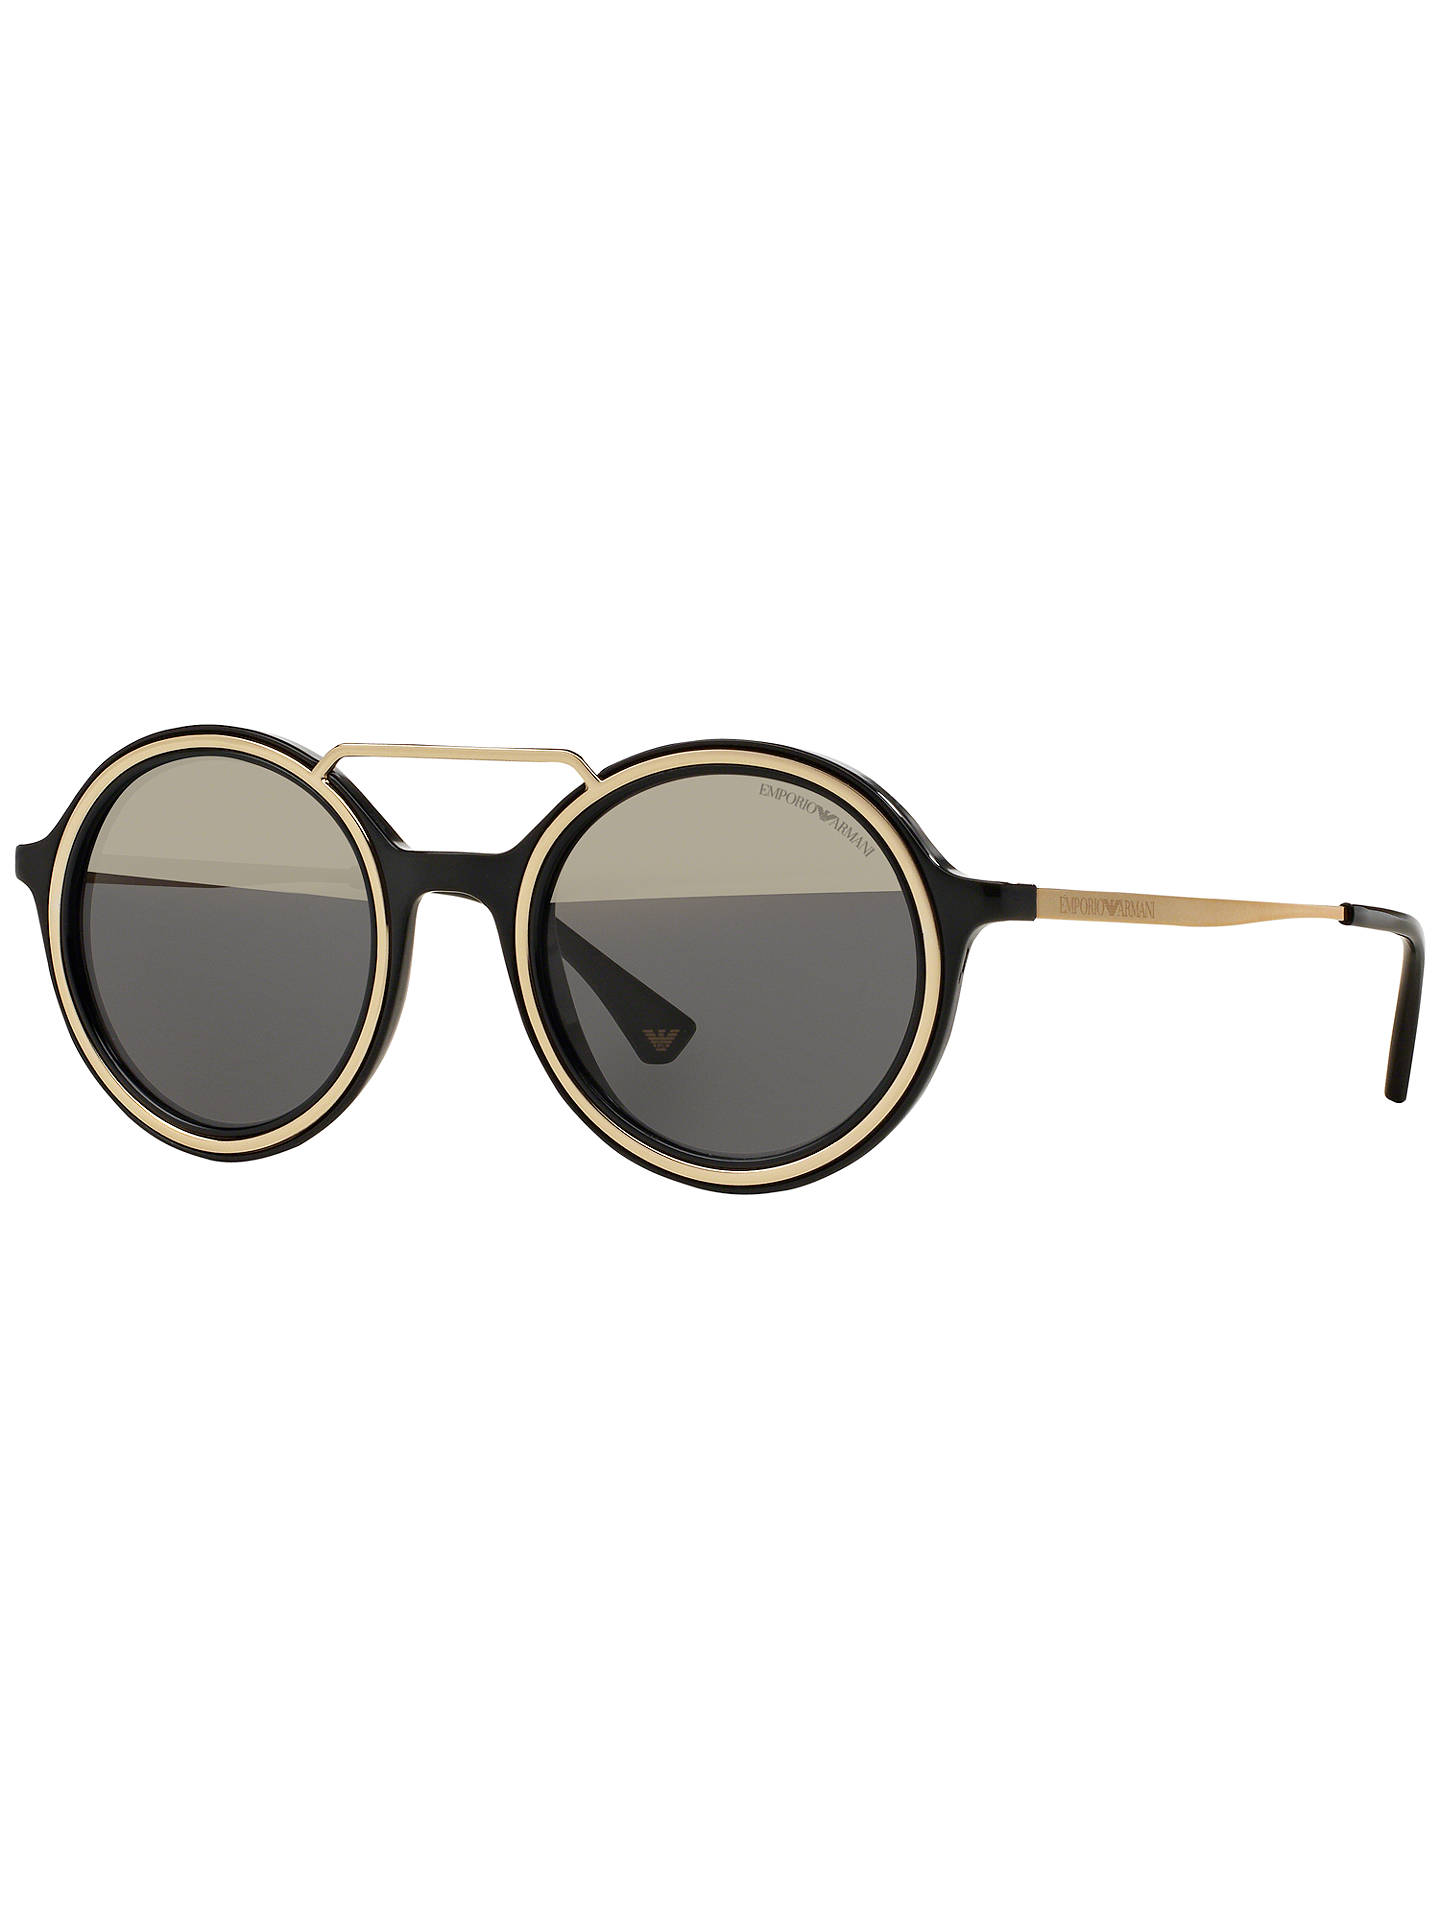 c8be8f2f94c Emporio Armani EA4062 Round Sunglasses at John Lewis   Partners